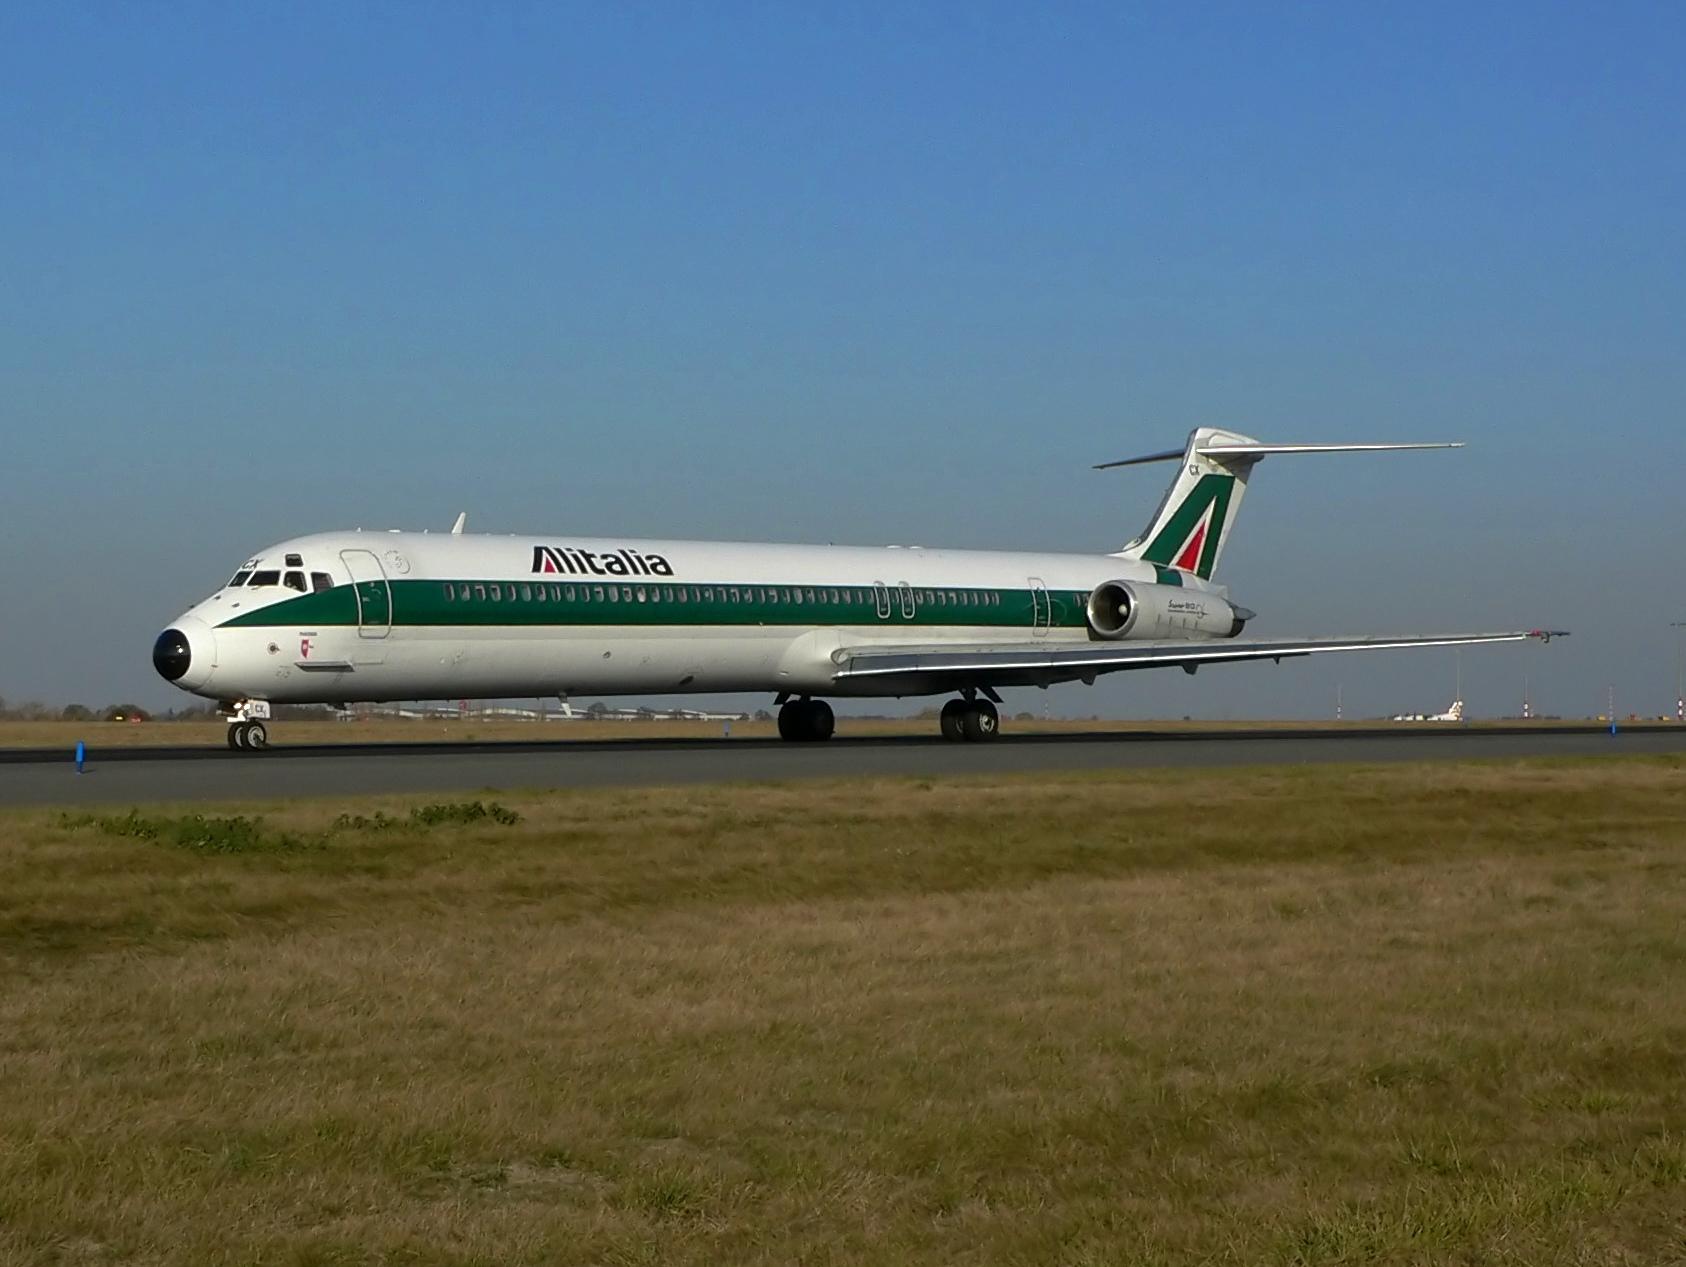 Avión MD-80 de Alitalia